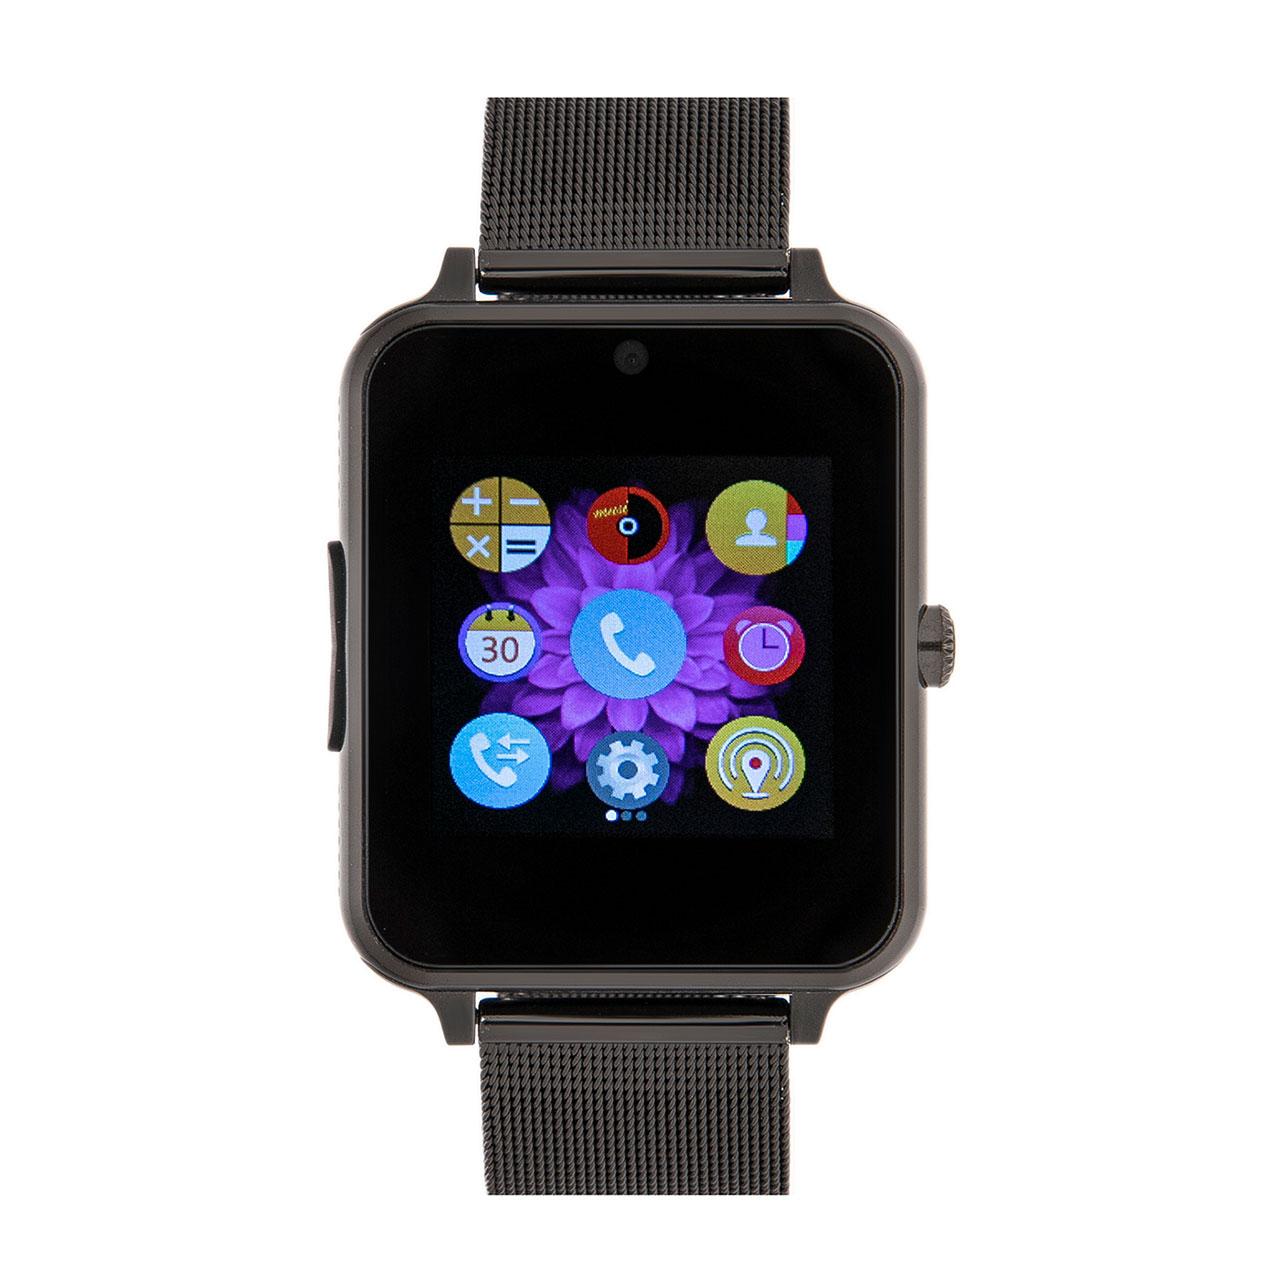 ساعت هوشمند ای-تاپ مدل ET-SW7 الف 001